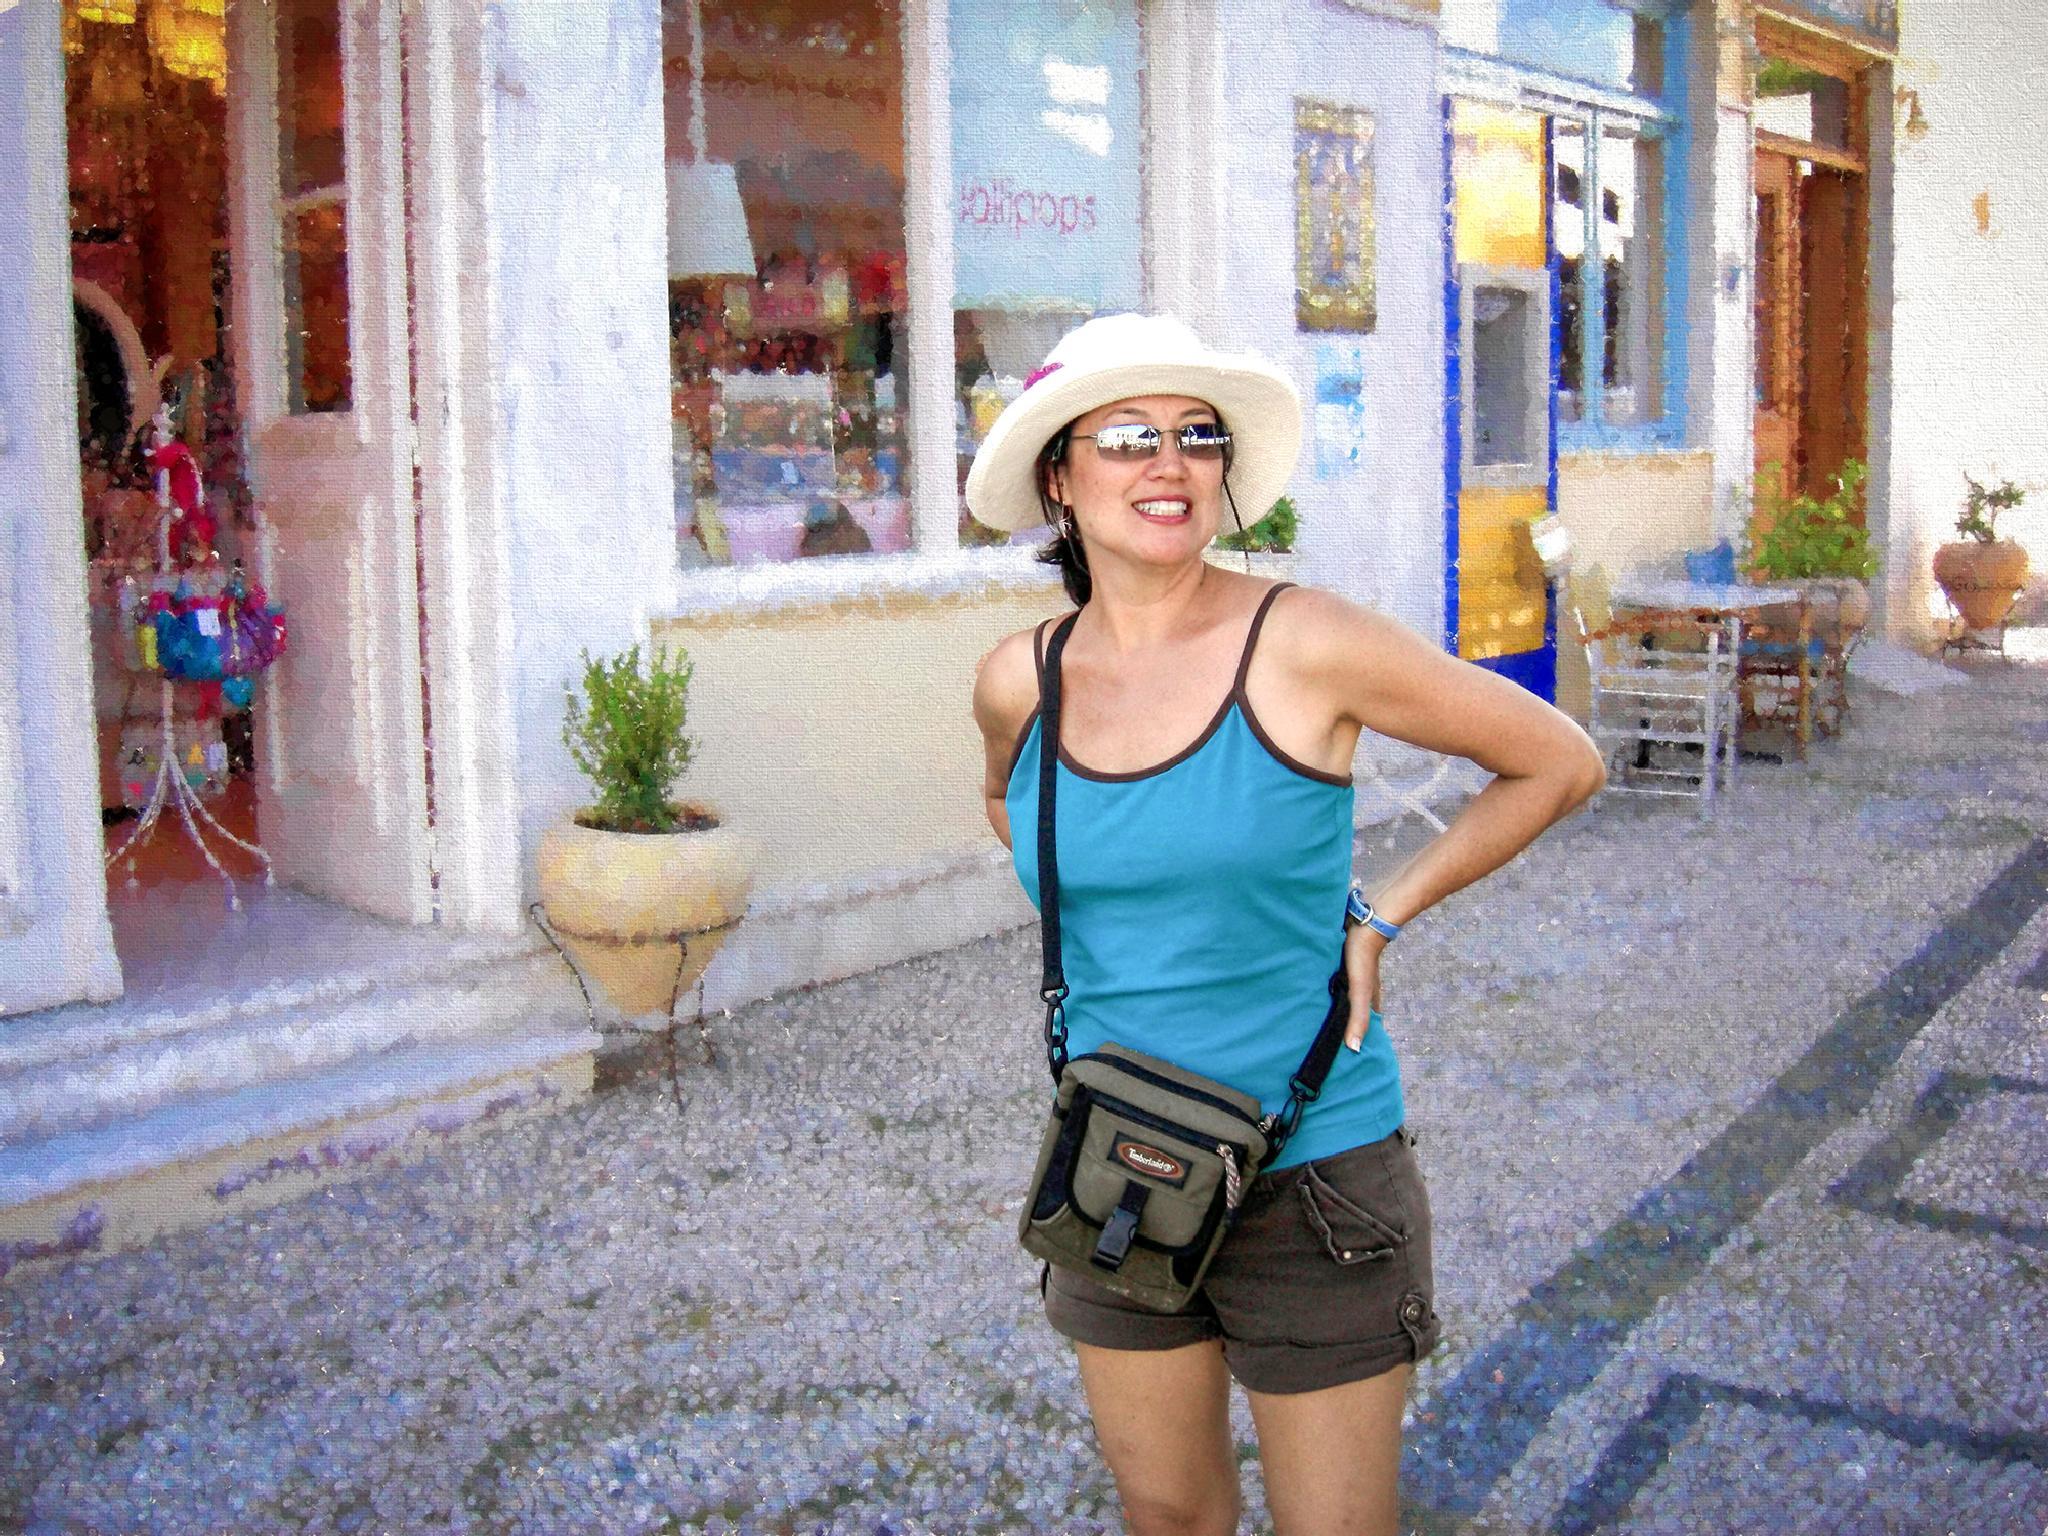 Peg the Tourist - Spetses, Greece by tedurquhart1